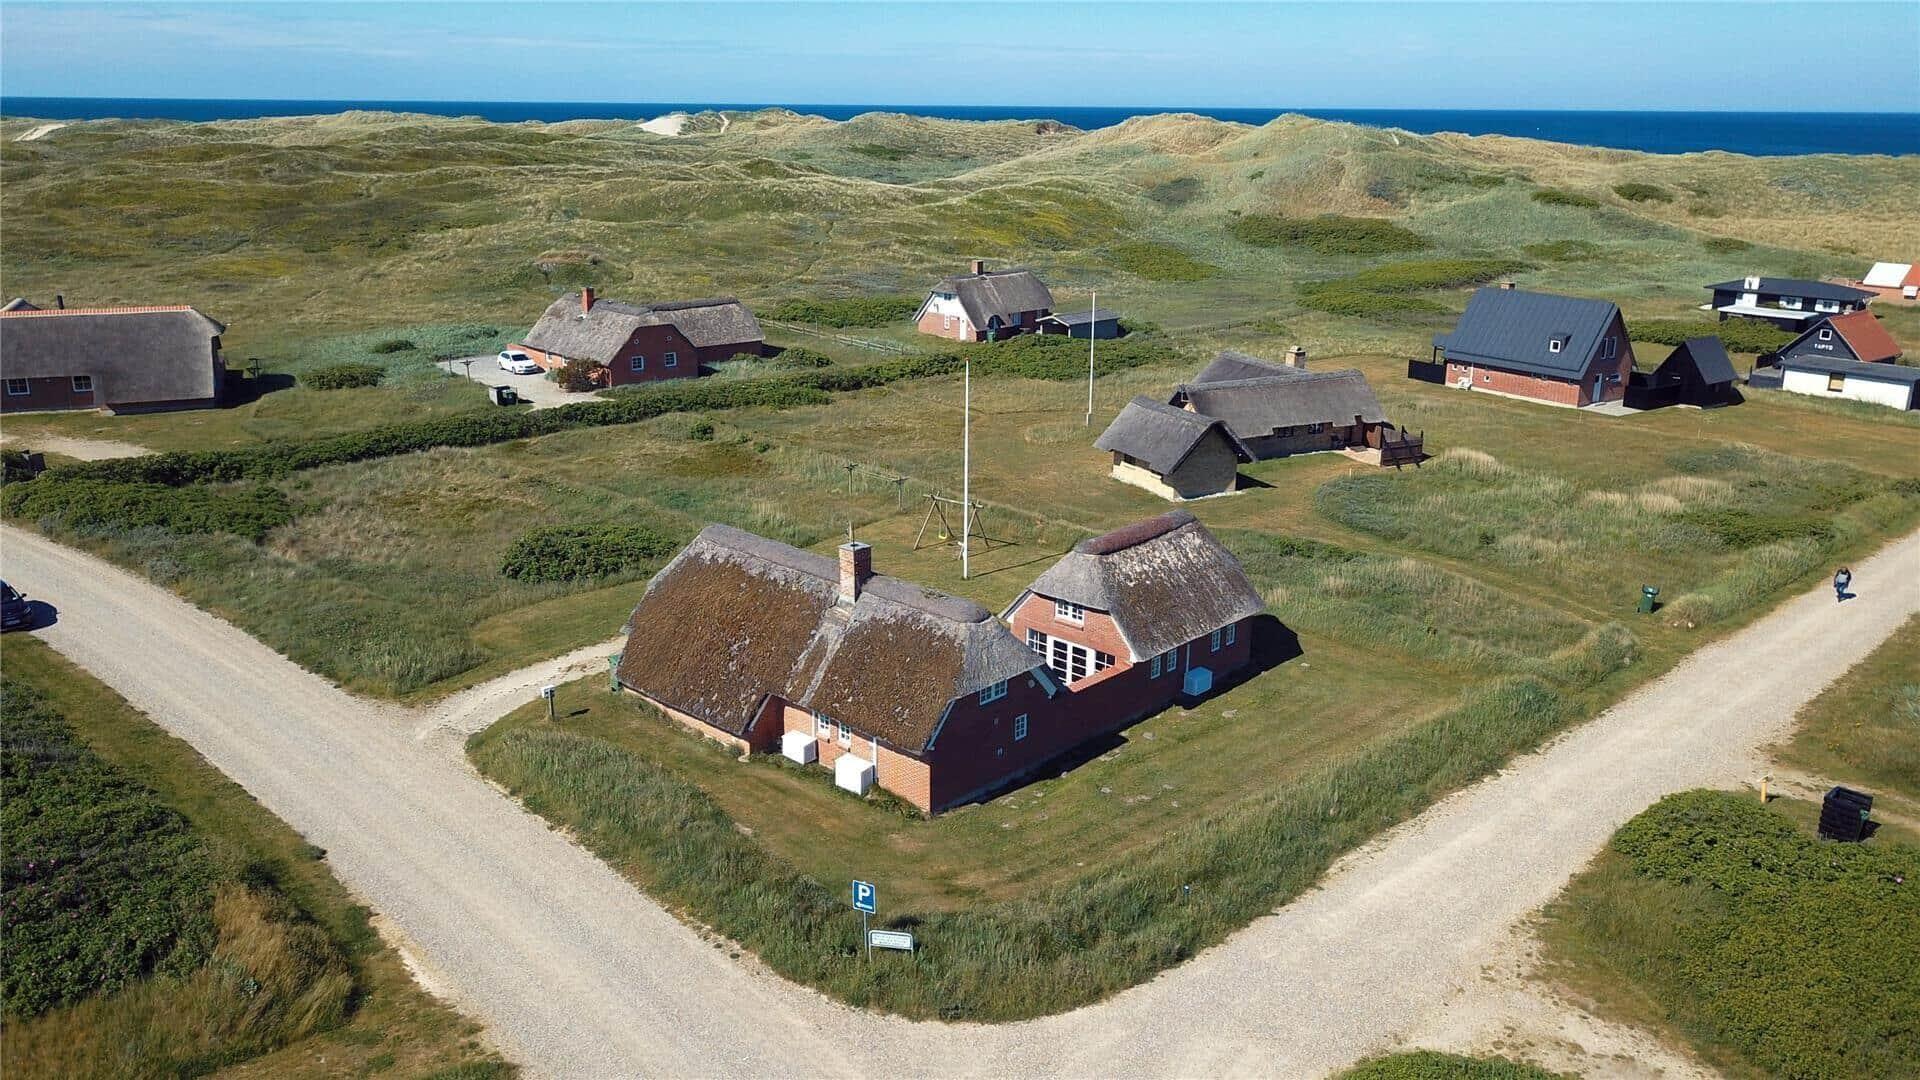 Bild 1-20 Ferienhaus 106, Vejlby Klit 38, DK - 7673 Harboøre